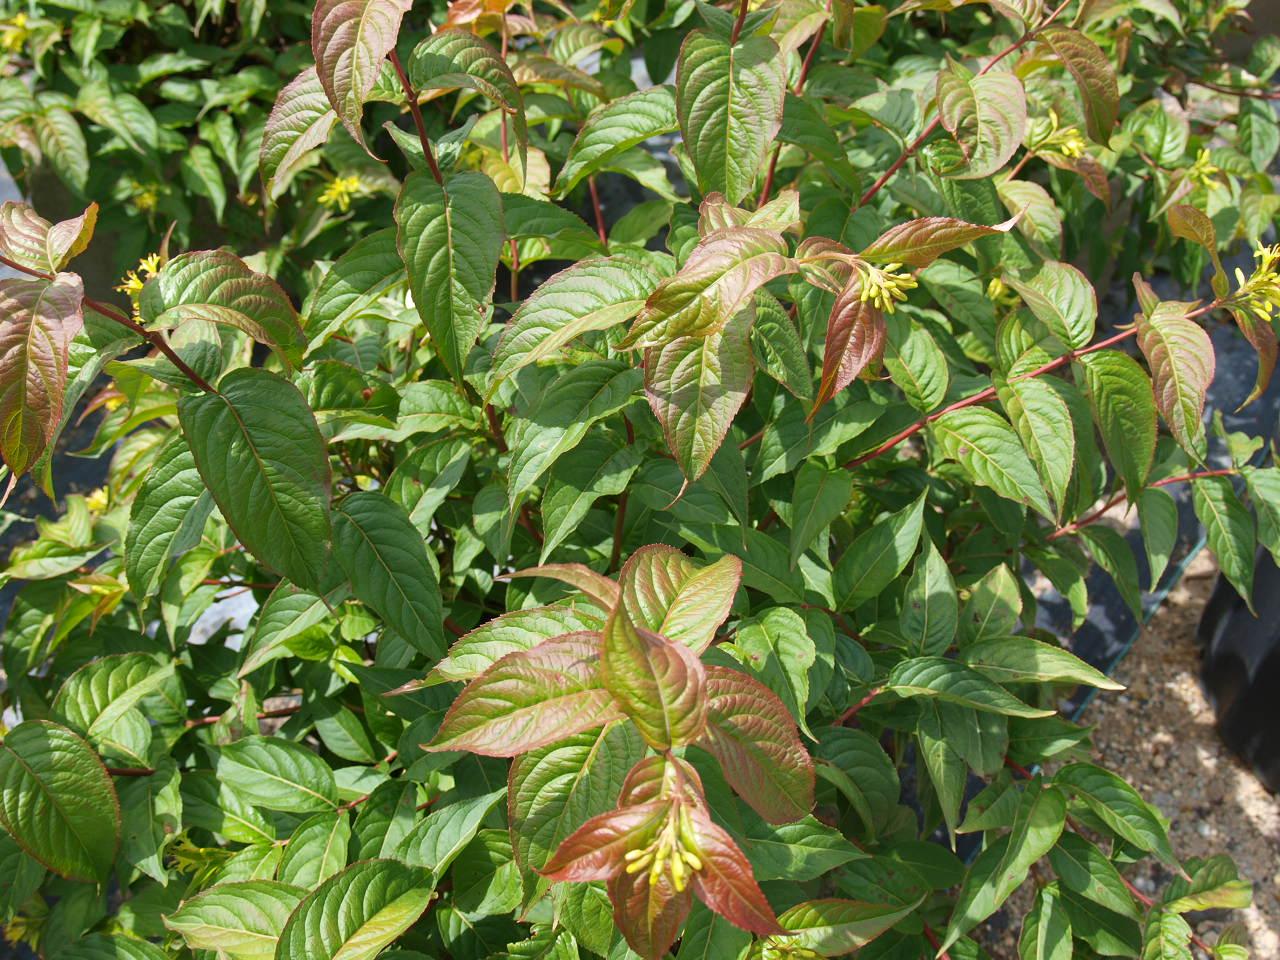 Landscaping With Honeysuckle : Dwarf bush honeysuckle knecht s nurseries landscaping